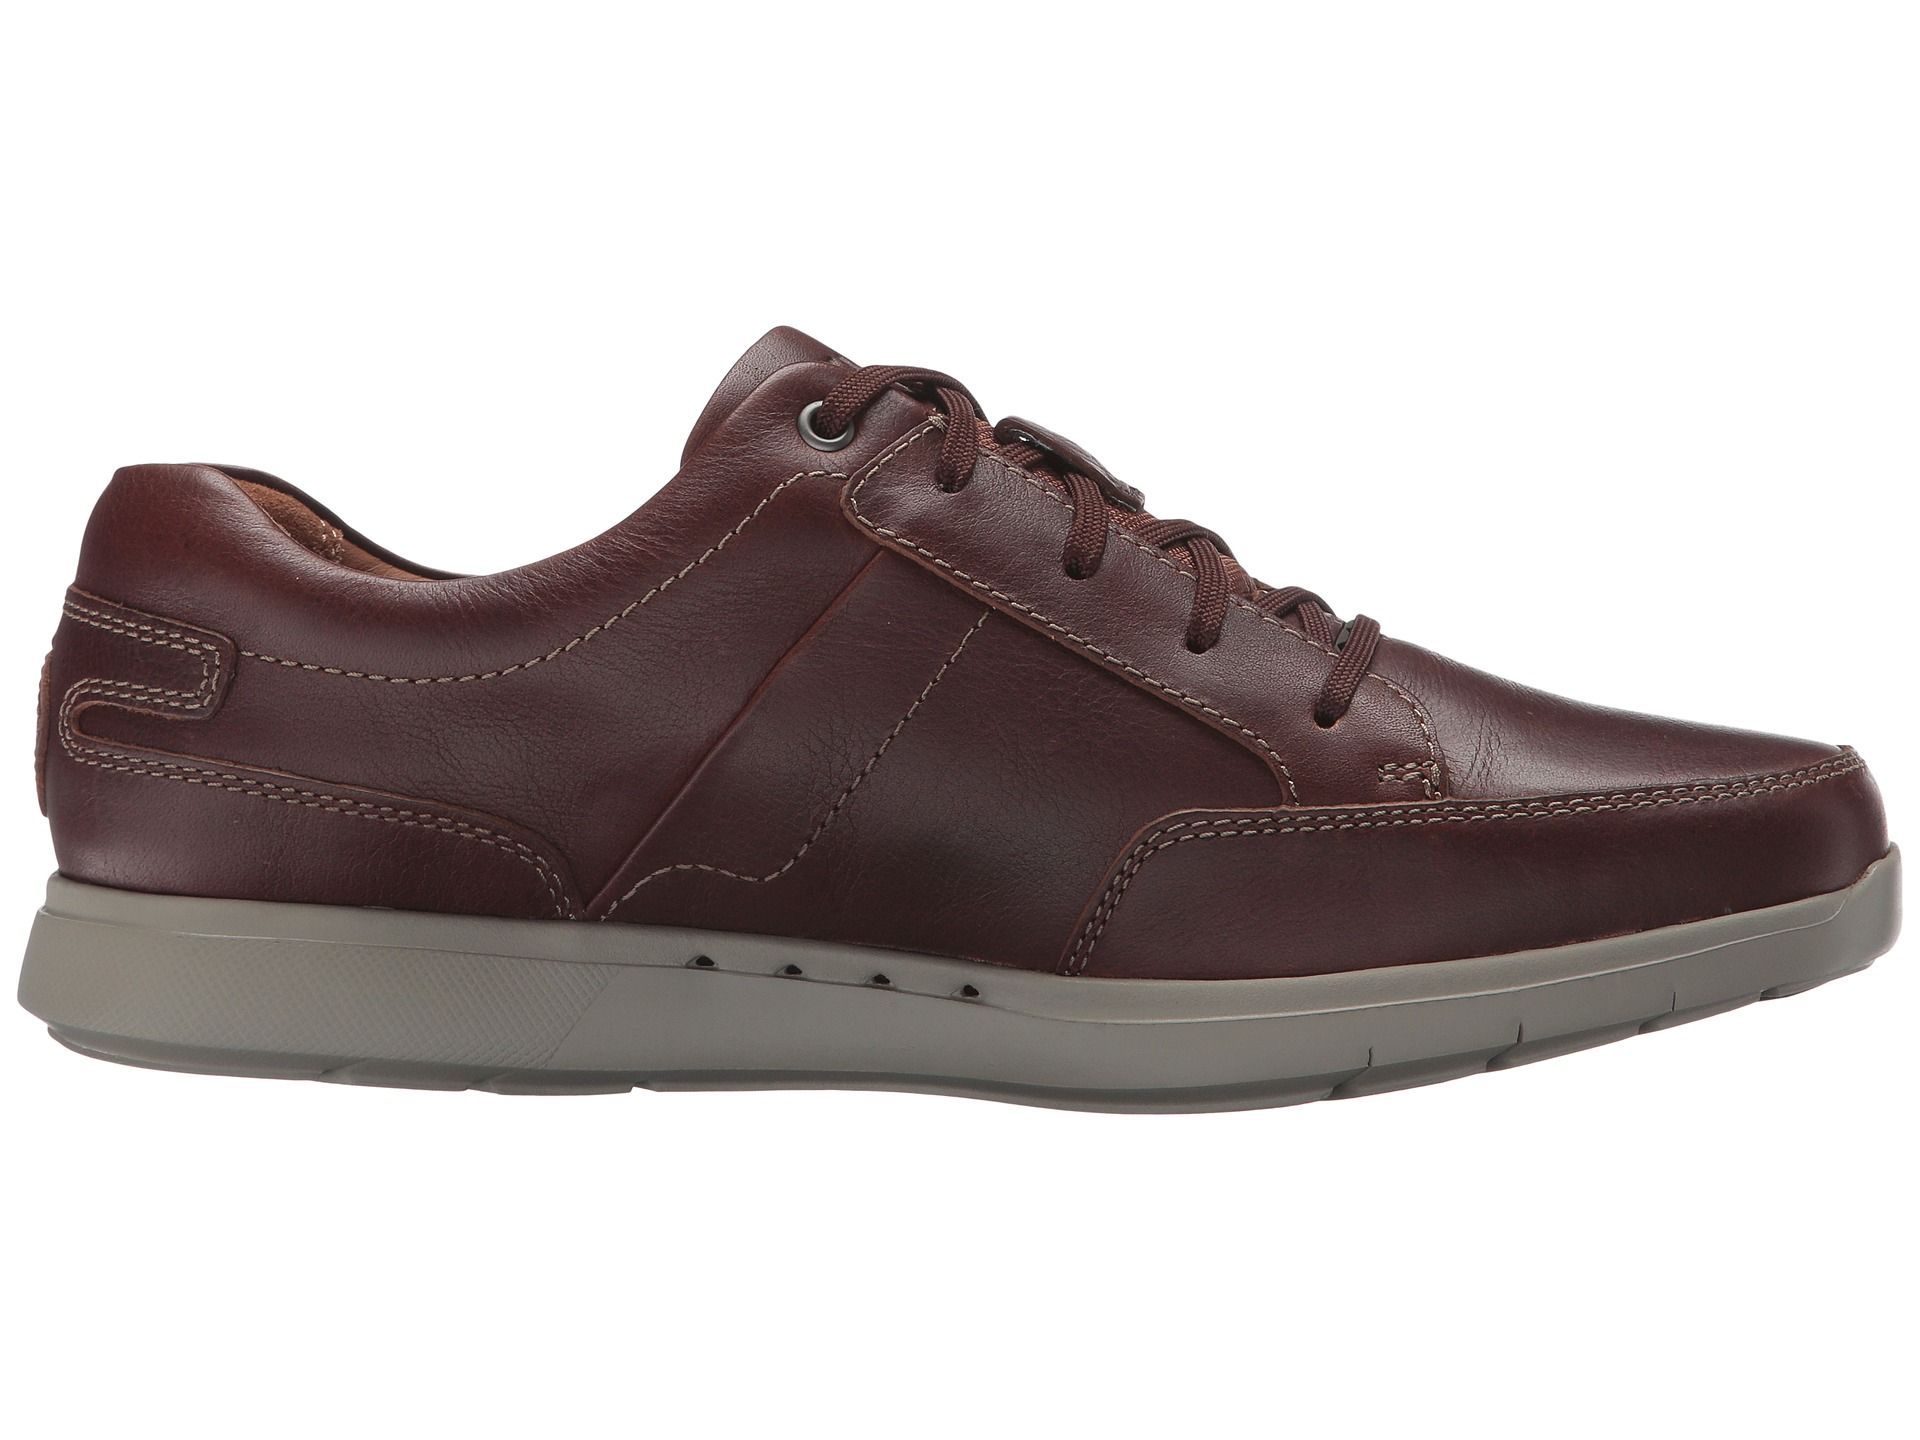 Evisu Brown Men S Casual Shoes